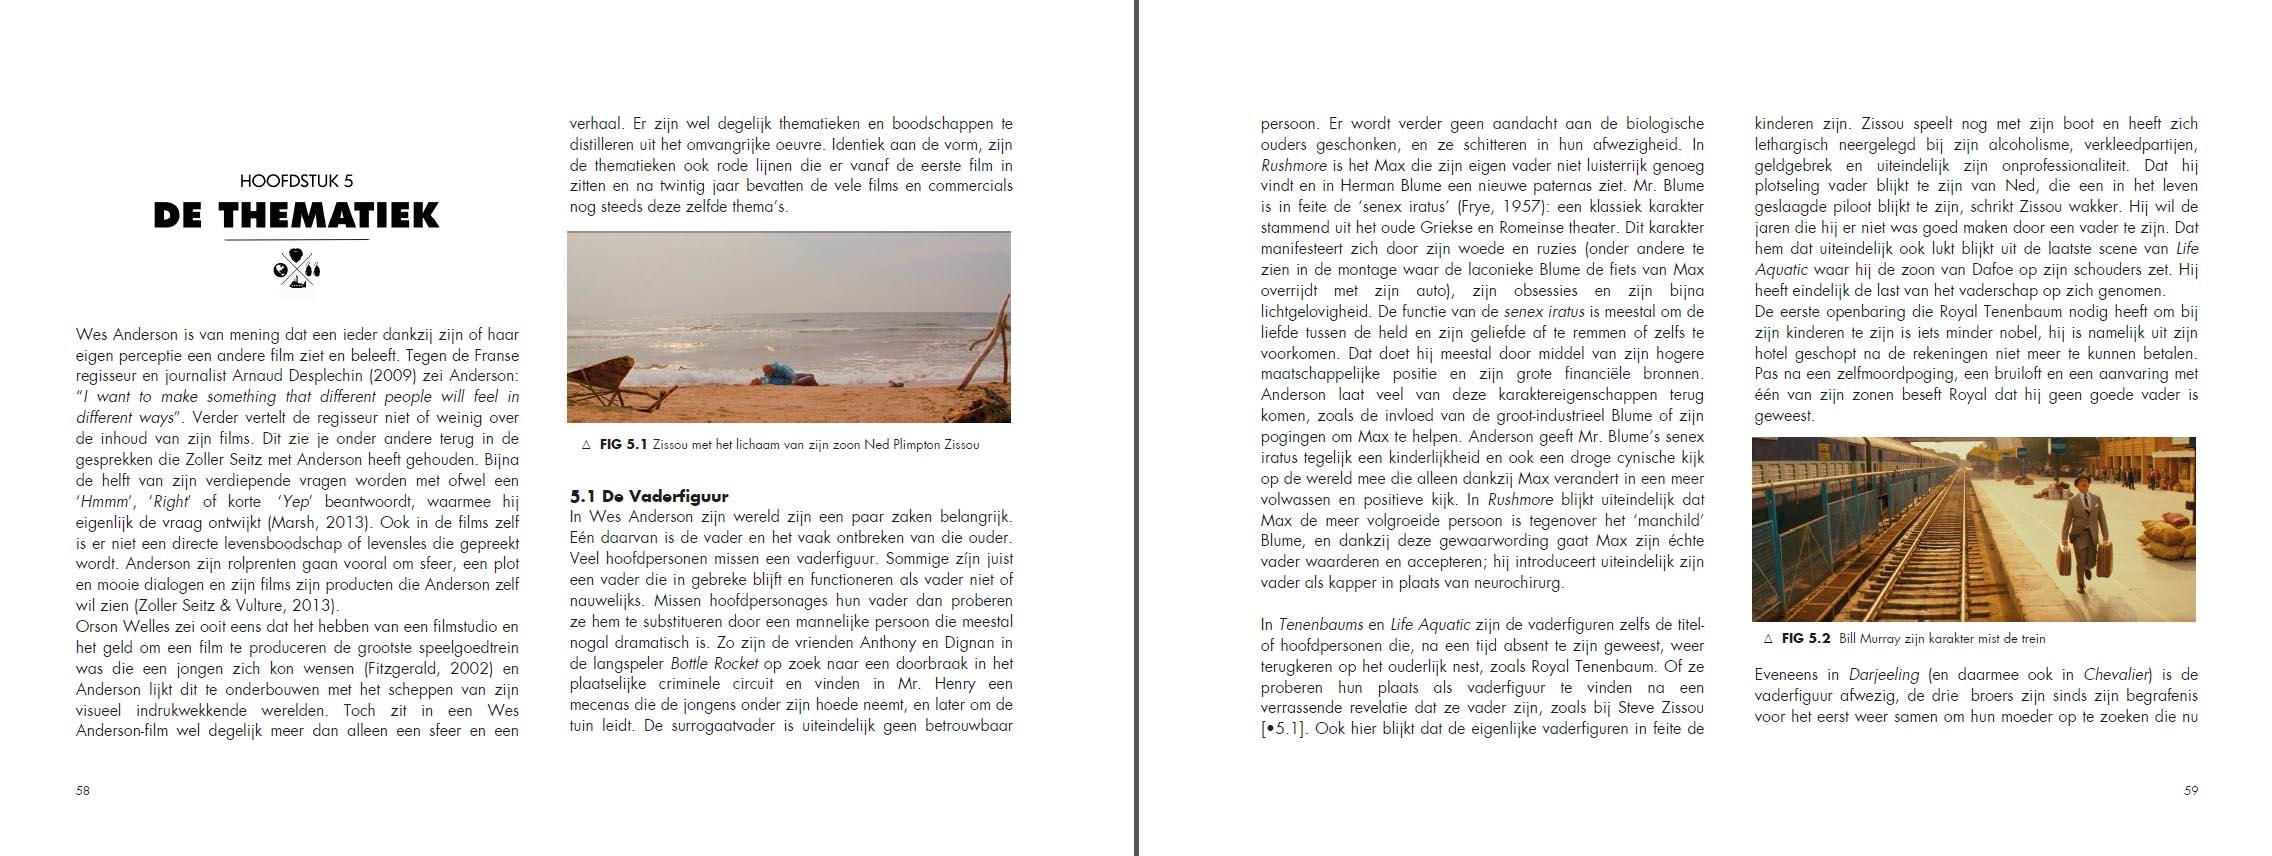 vb paginas5